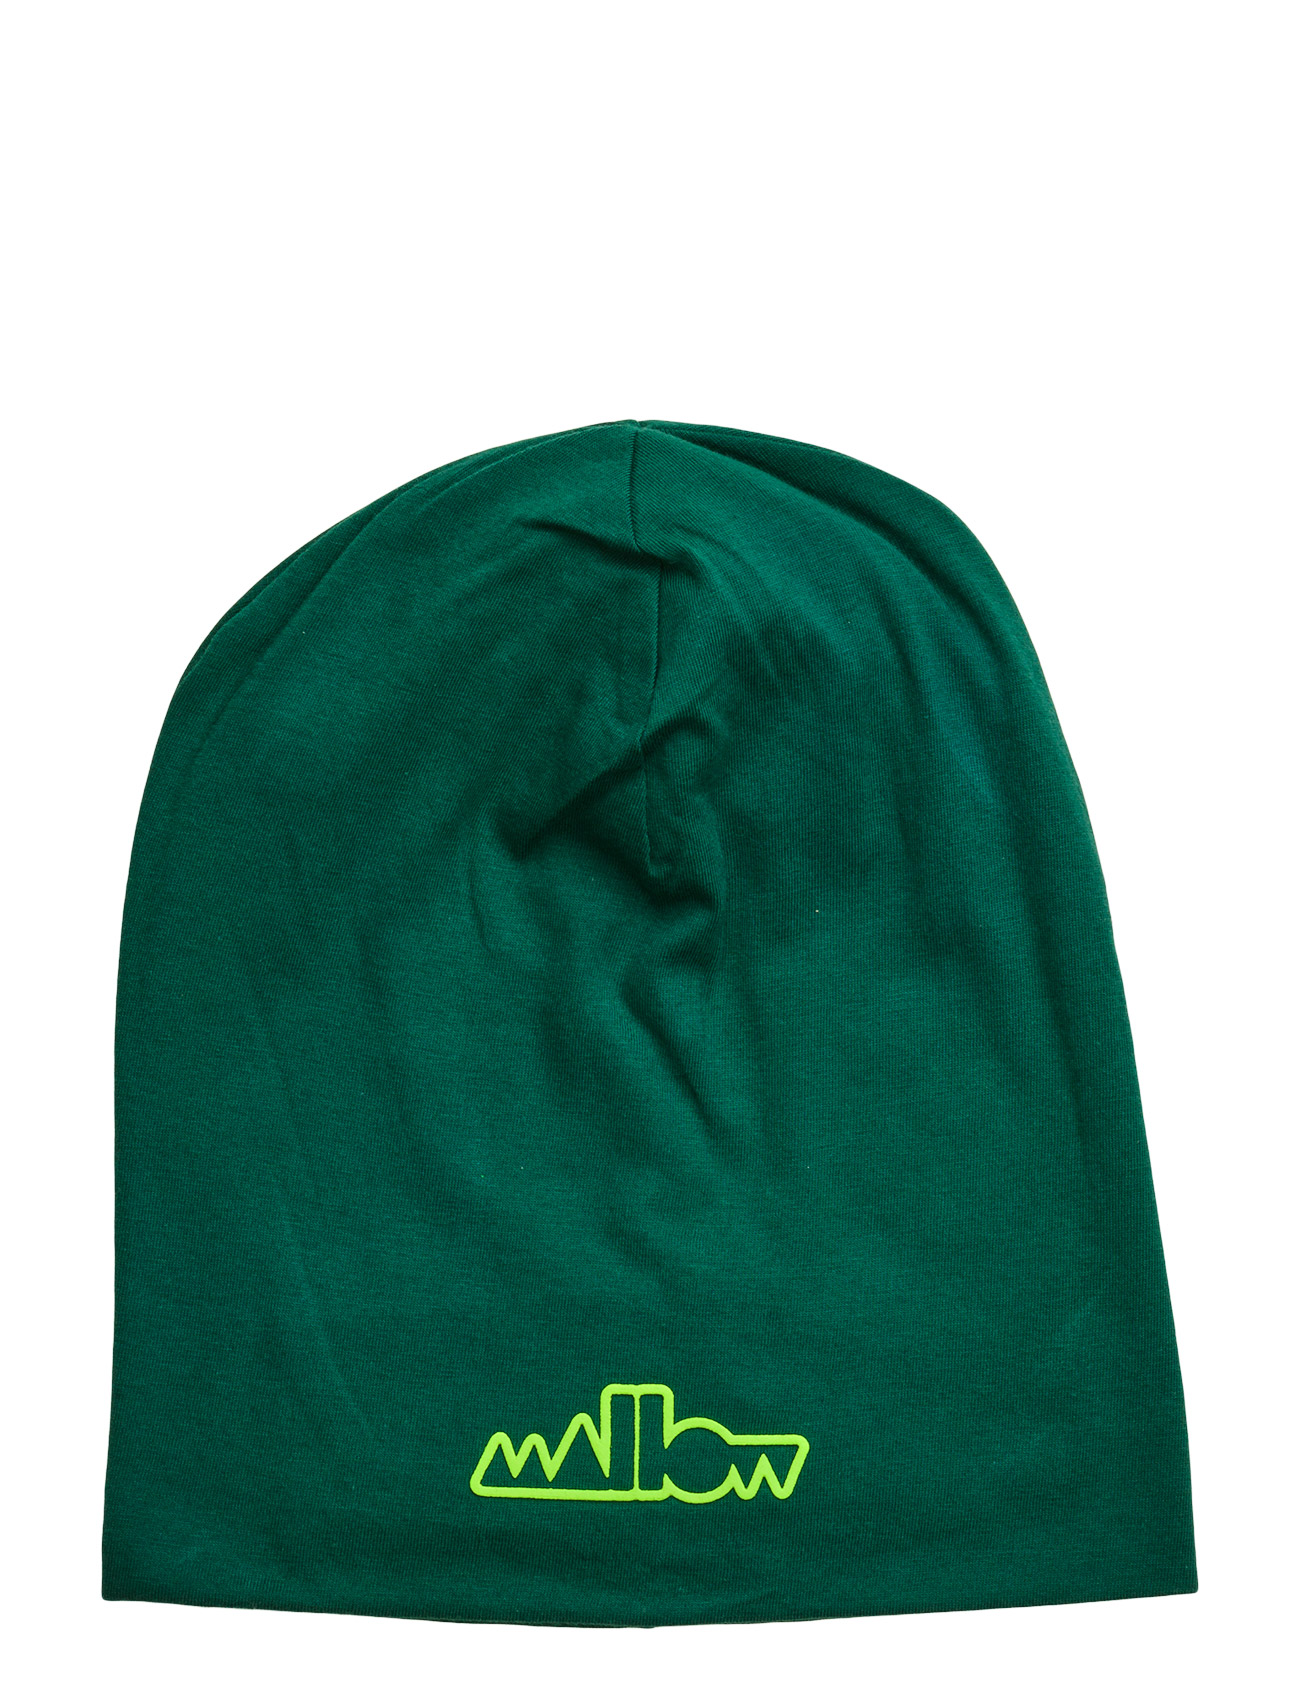 Ni Beanie Hat Mallow Overtøj til Drenge i Grøn